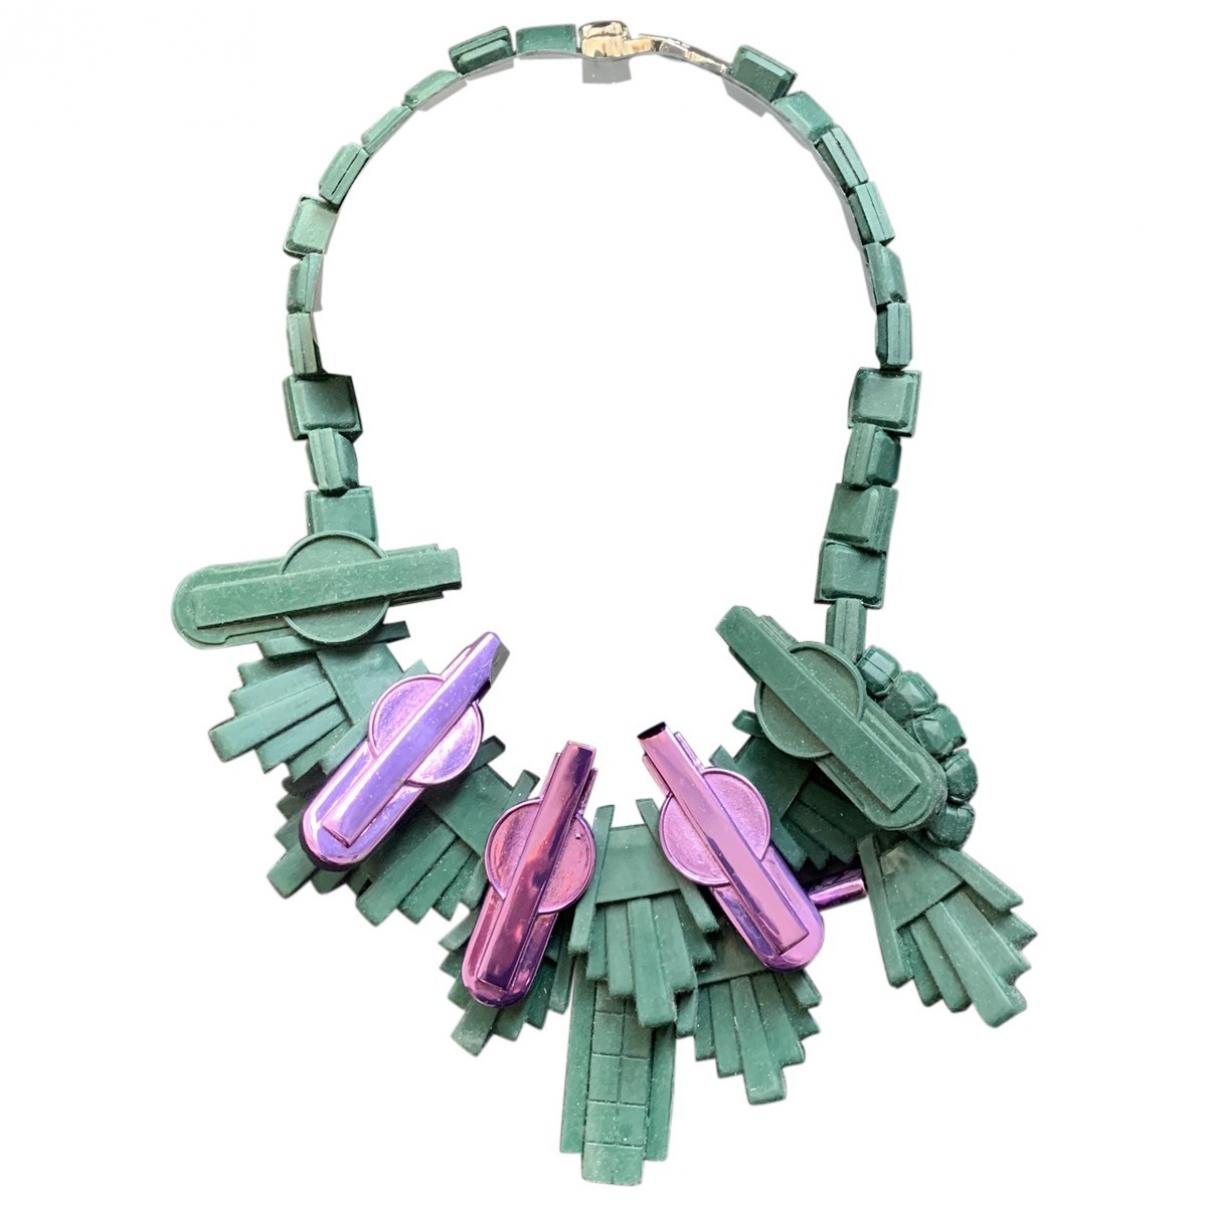 Ek Thongprasert \N Green necklace for Women \N